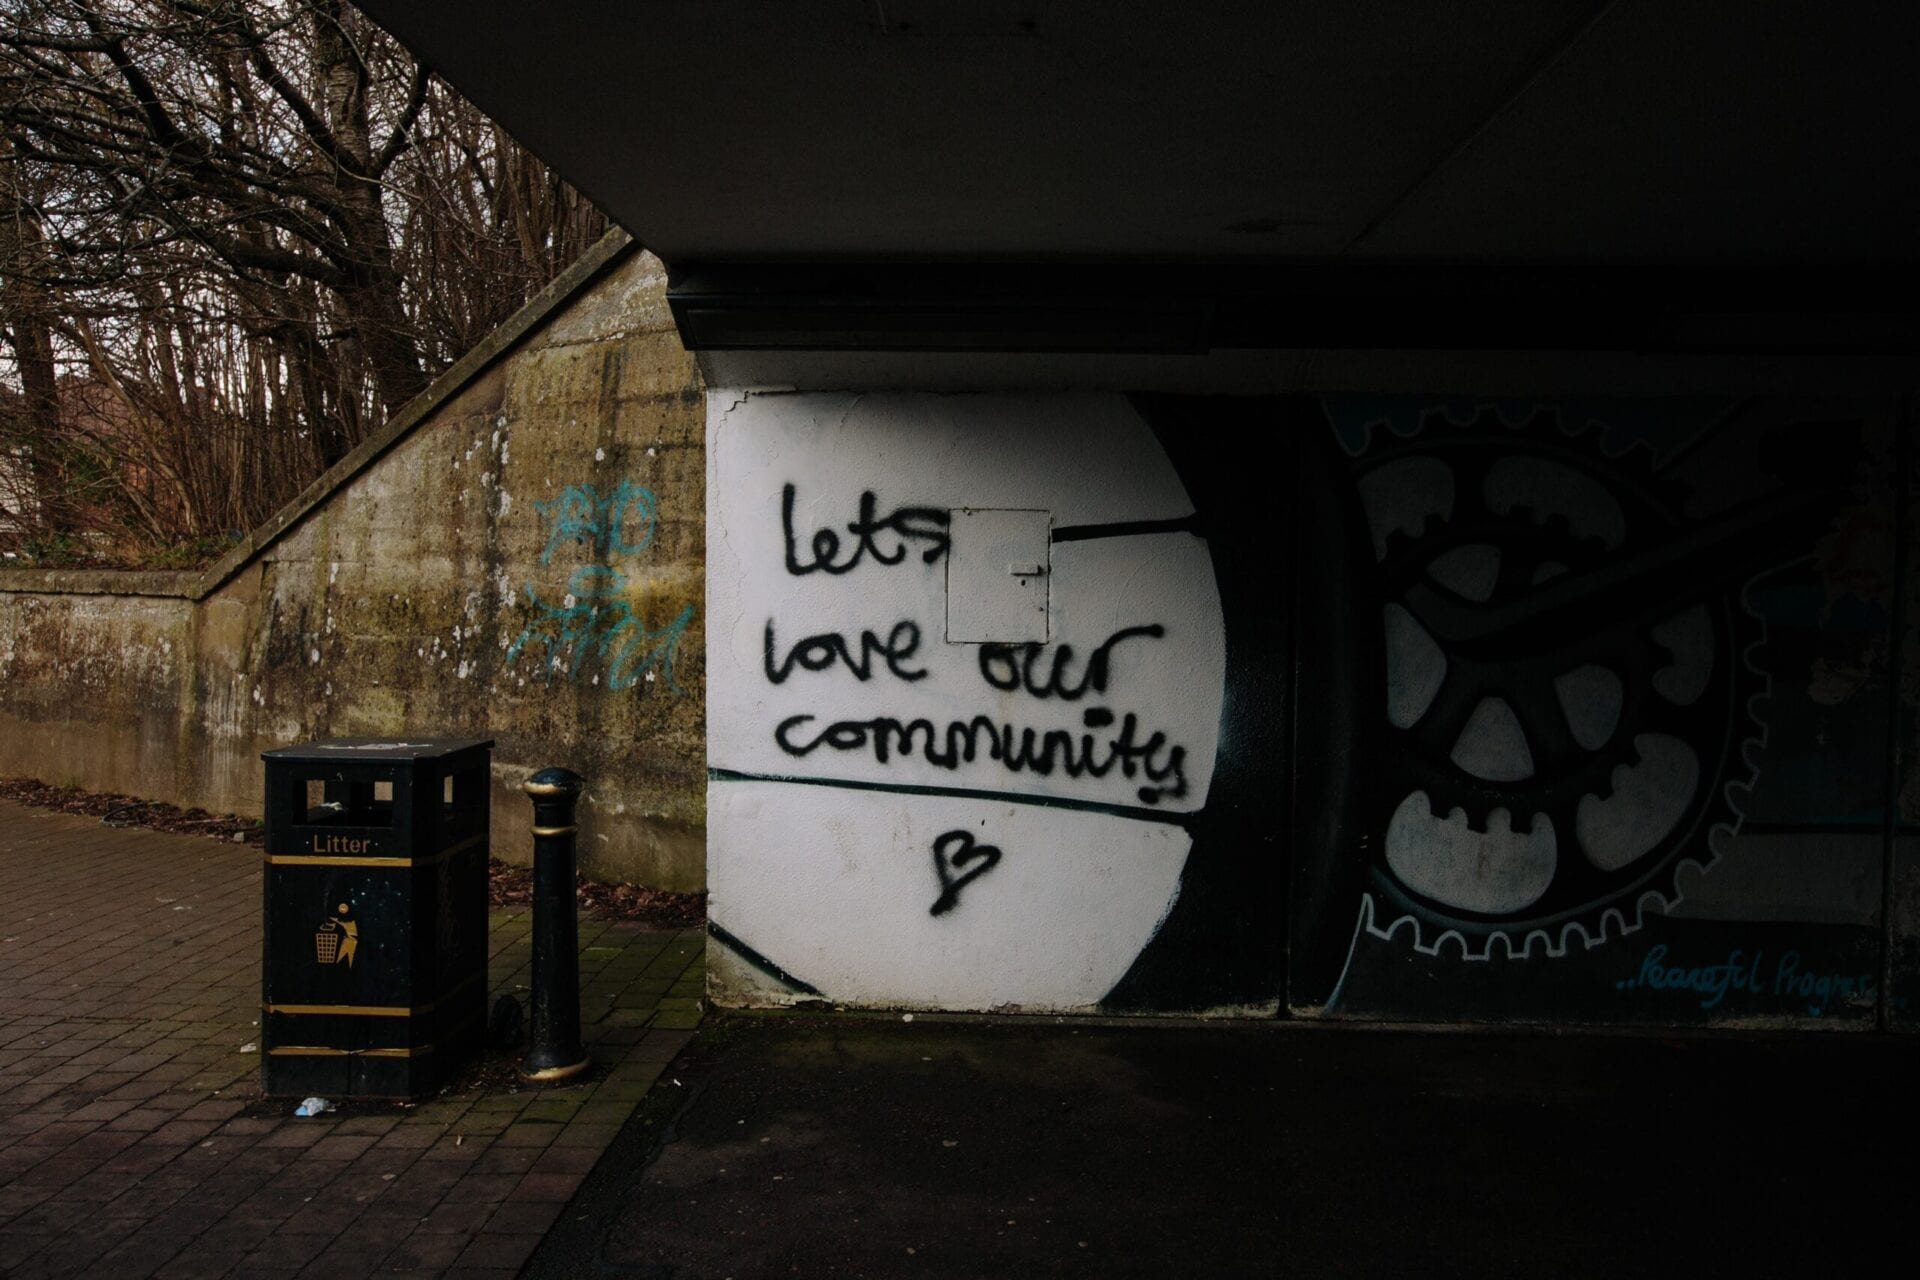 Let's love our community